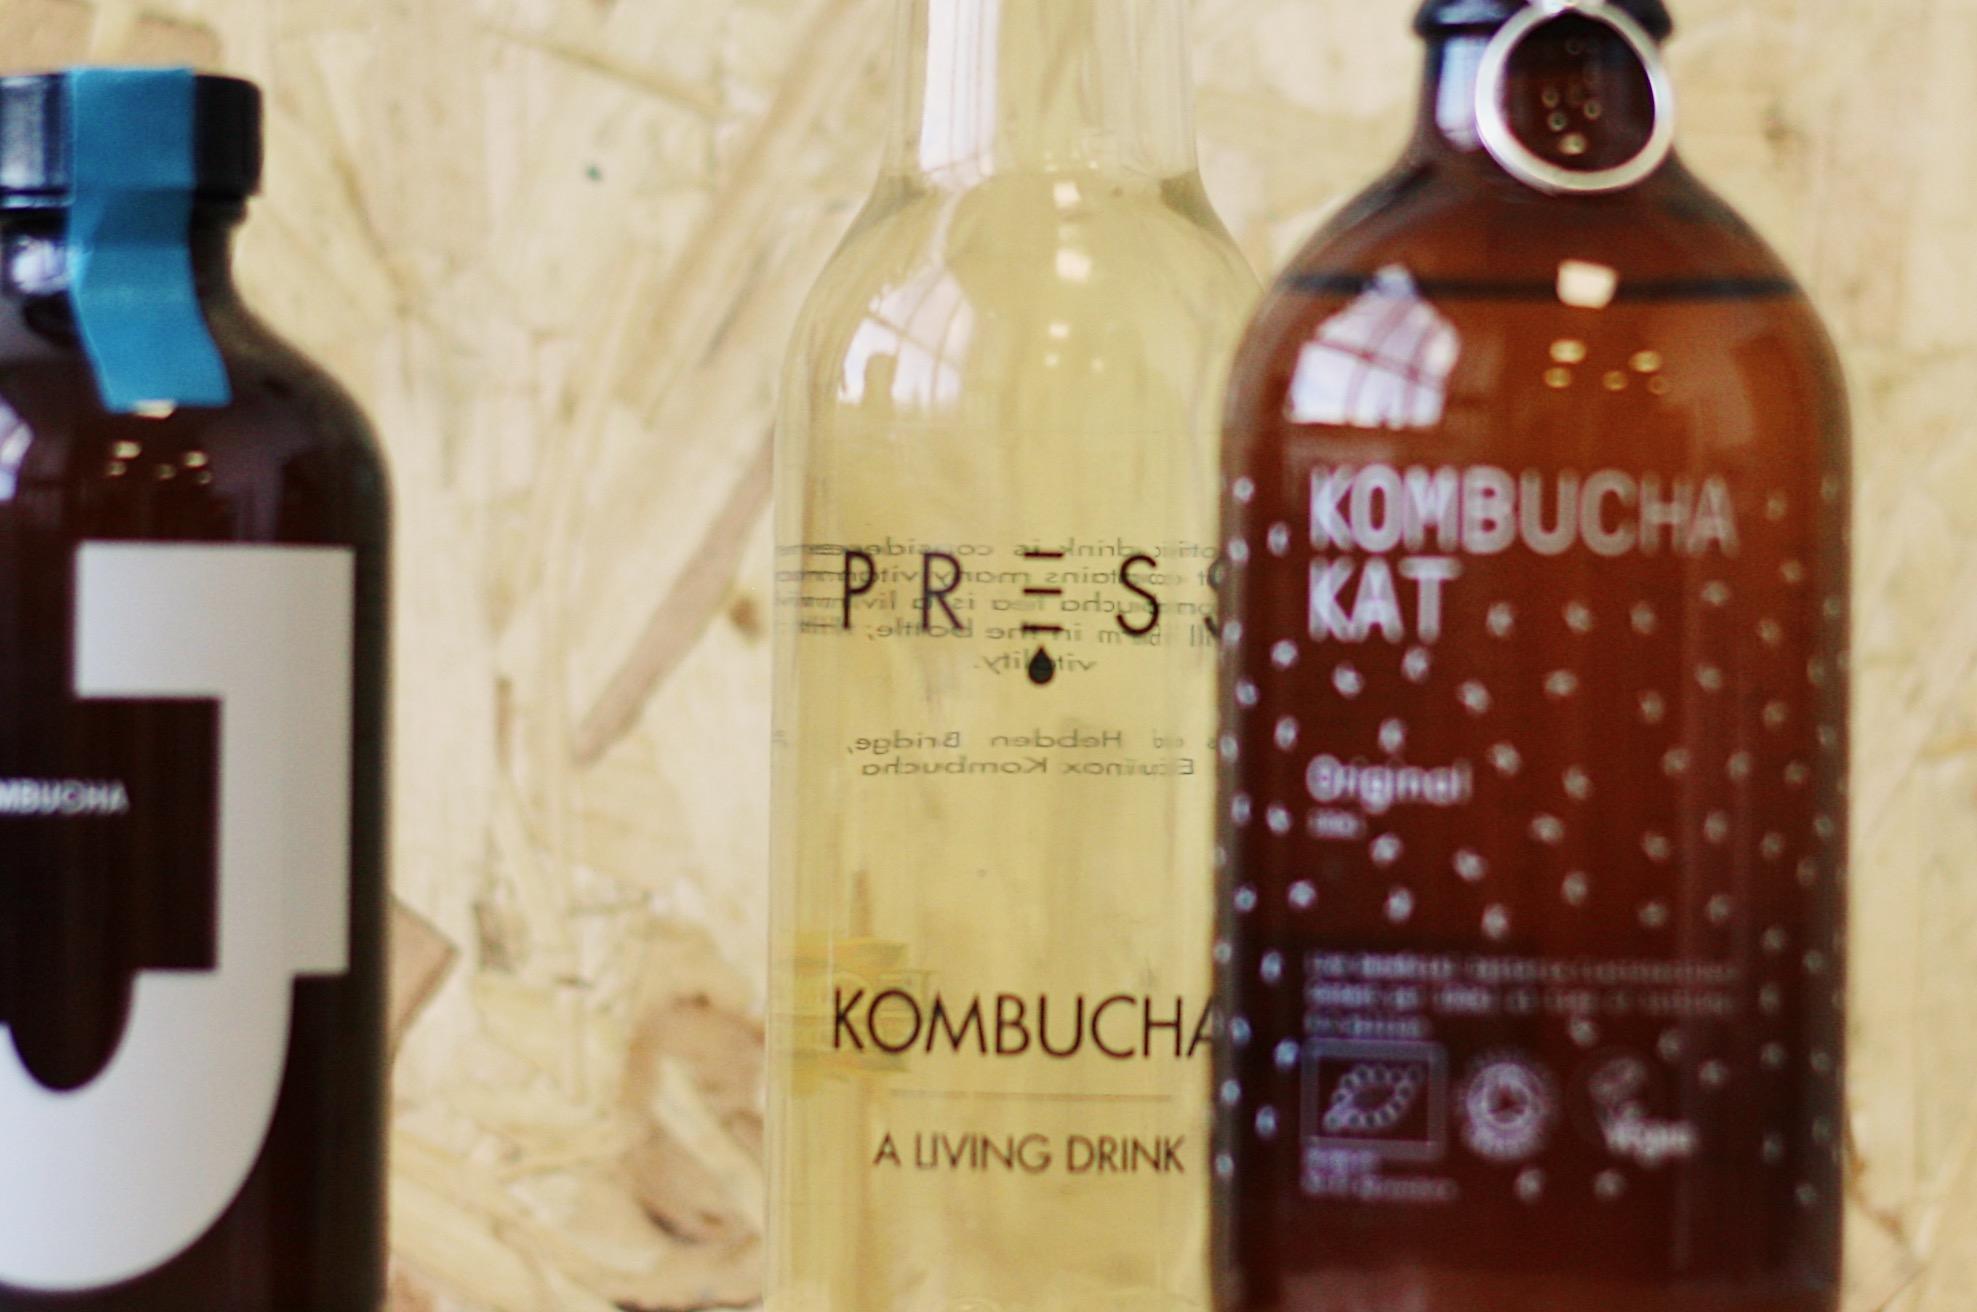 press-equinox-kombucha